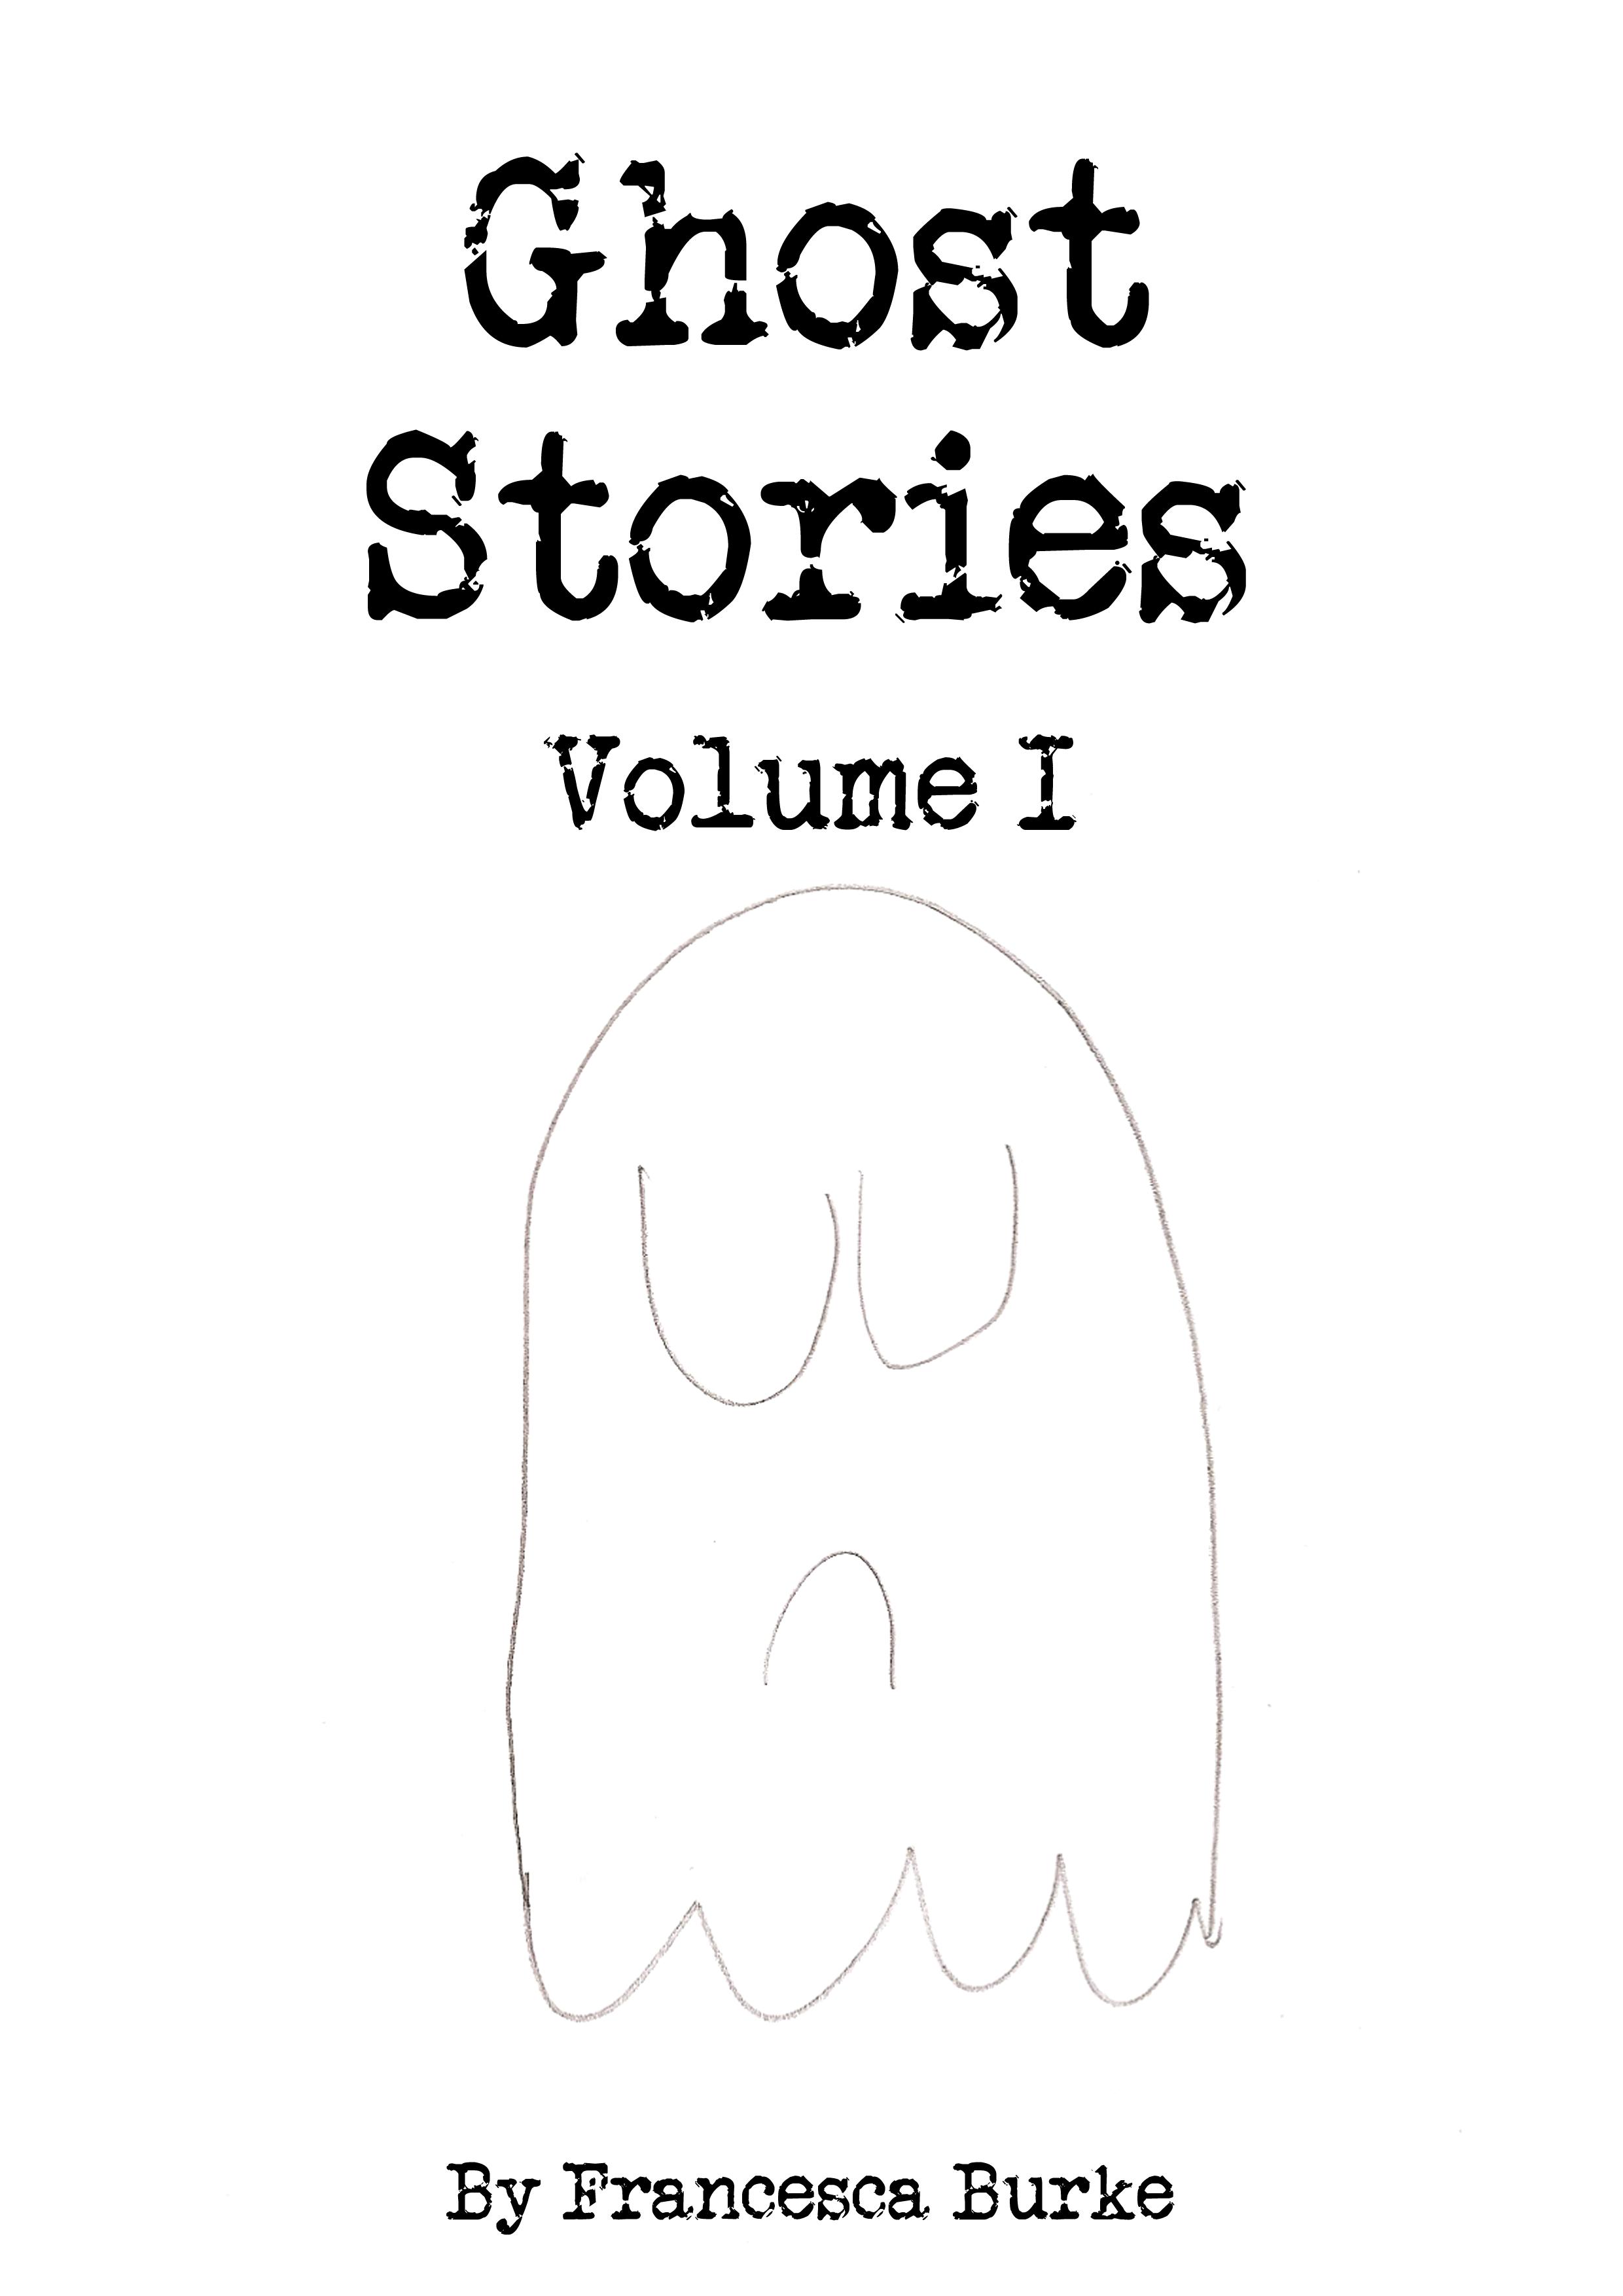 Ghost Stories Volume I by Francesca Burke